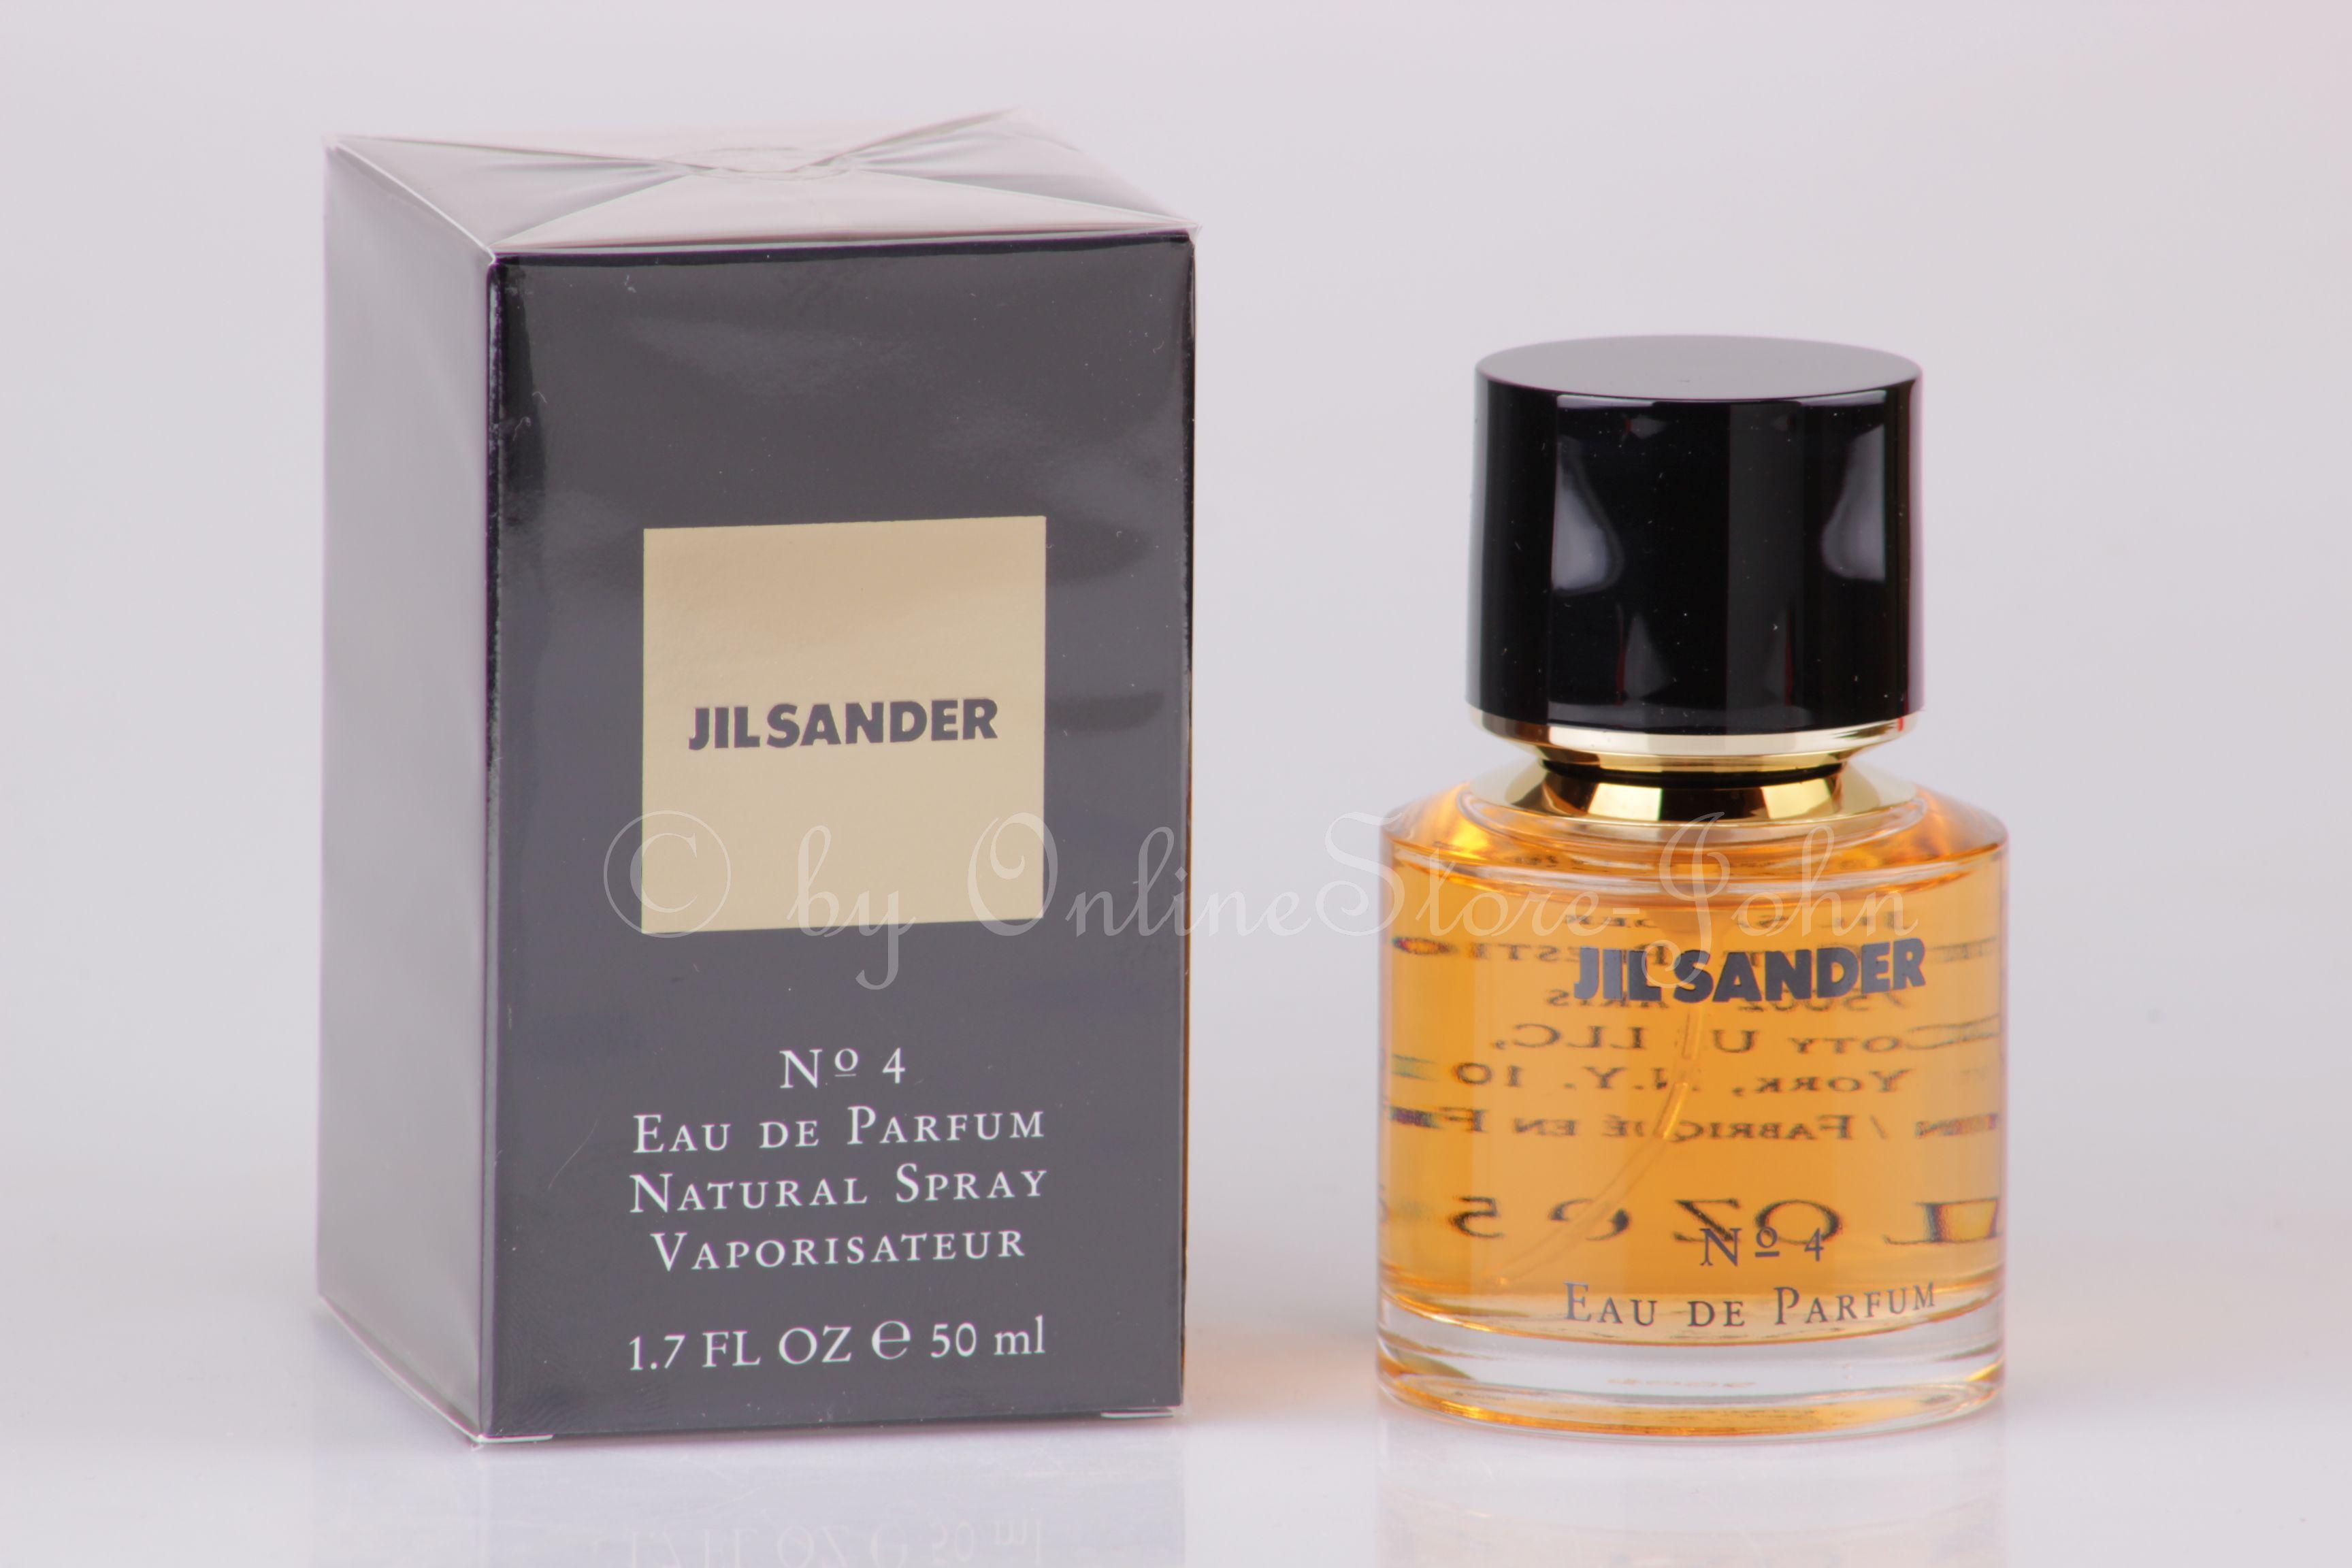 Jil Sander - No. 4 - 50ml EDP Eau de Parfum 64ff8722e269